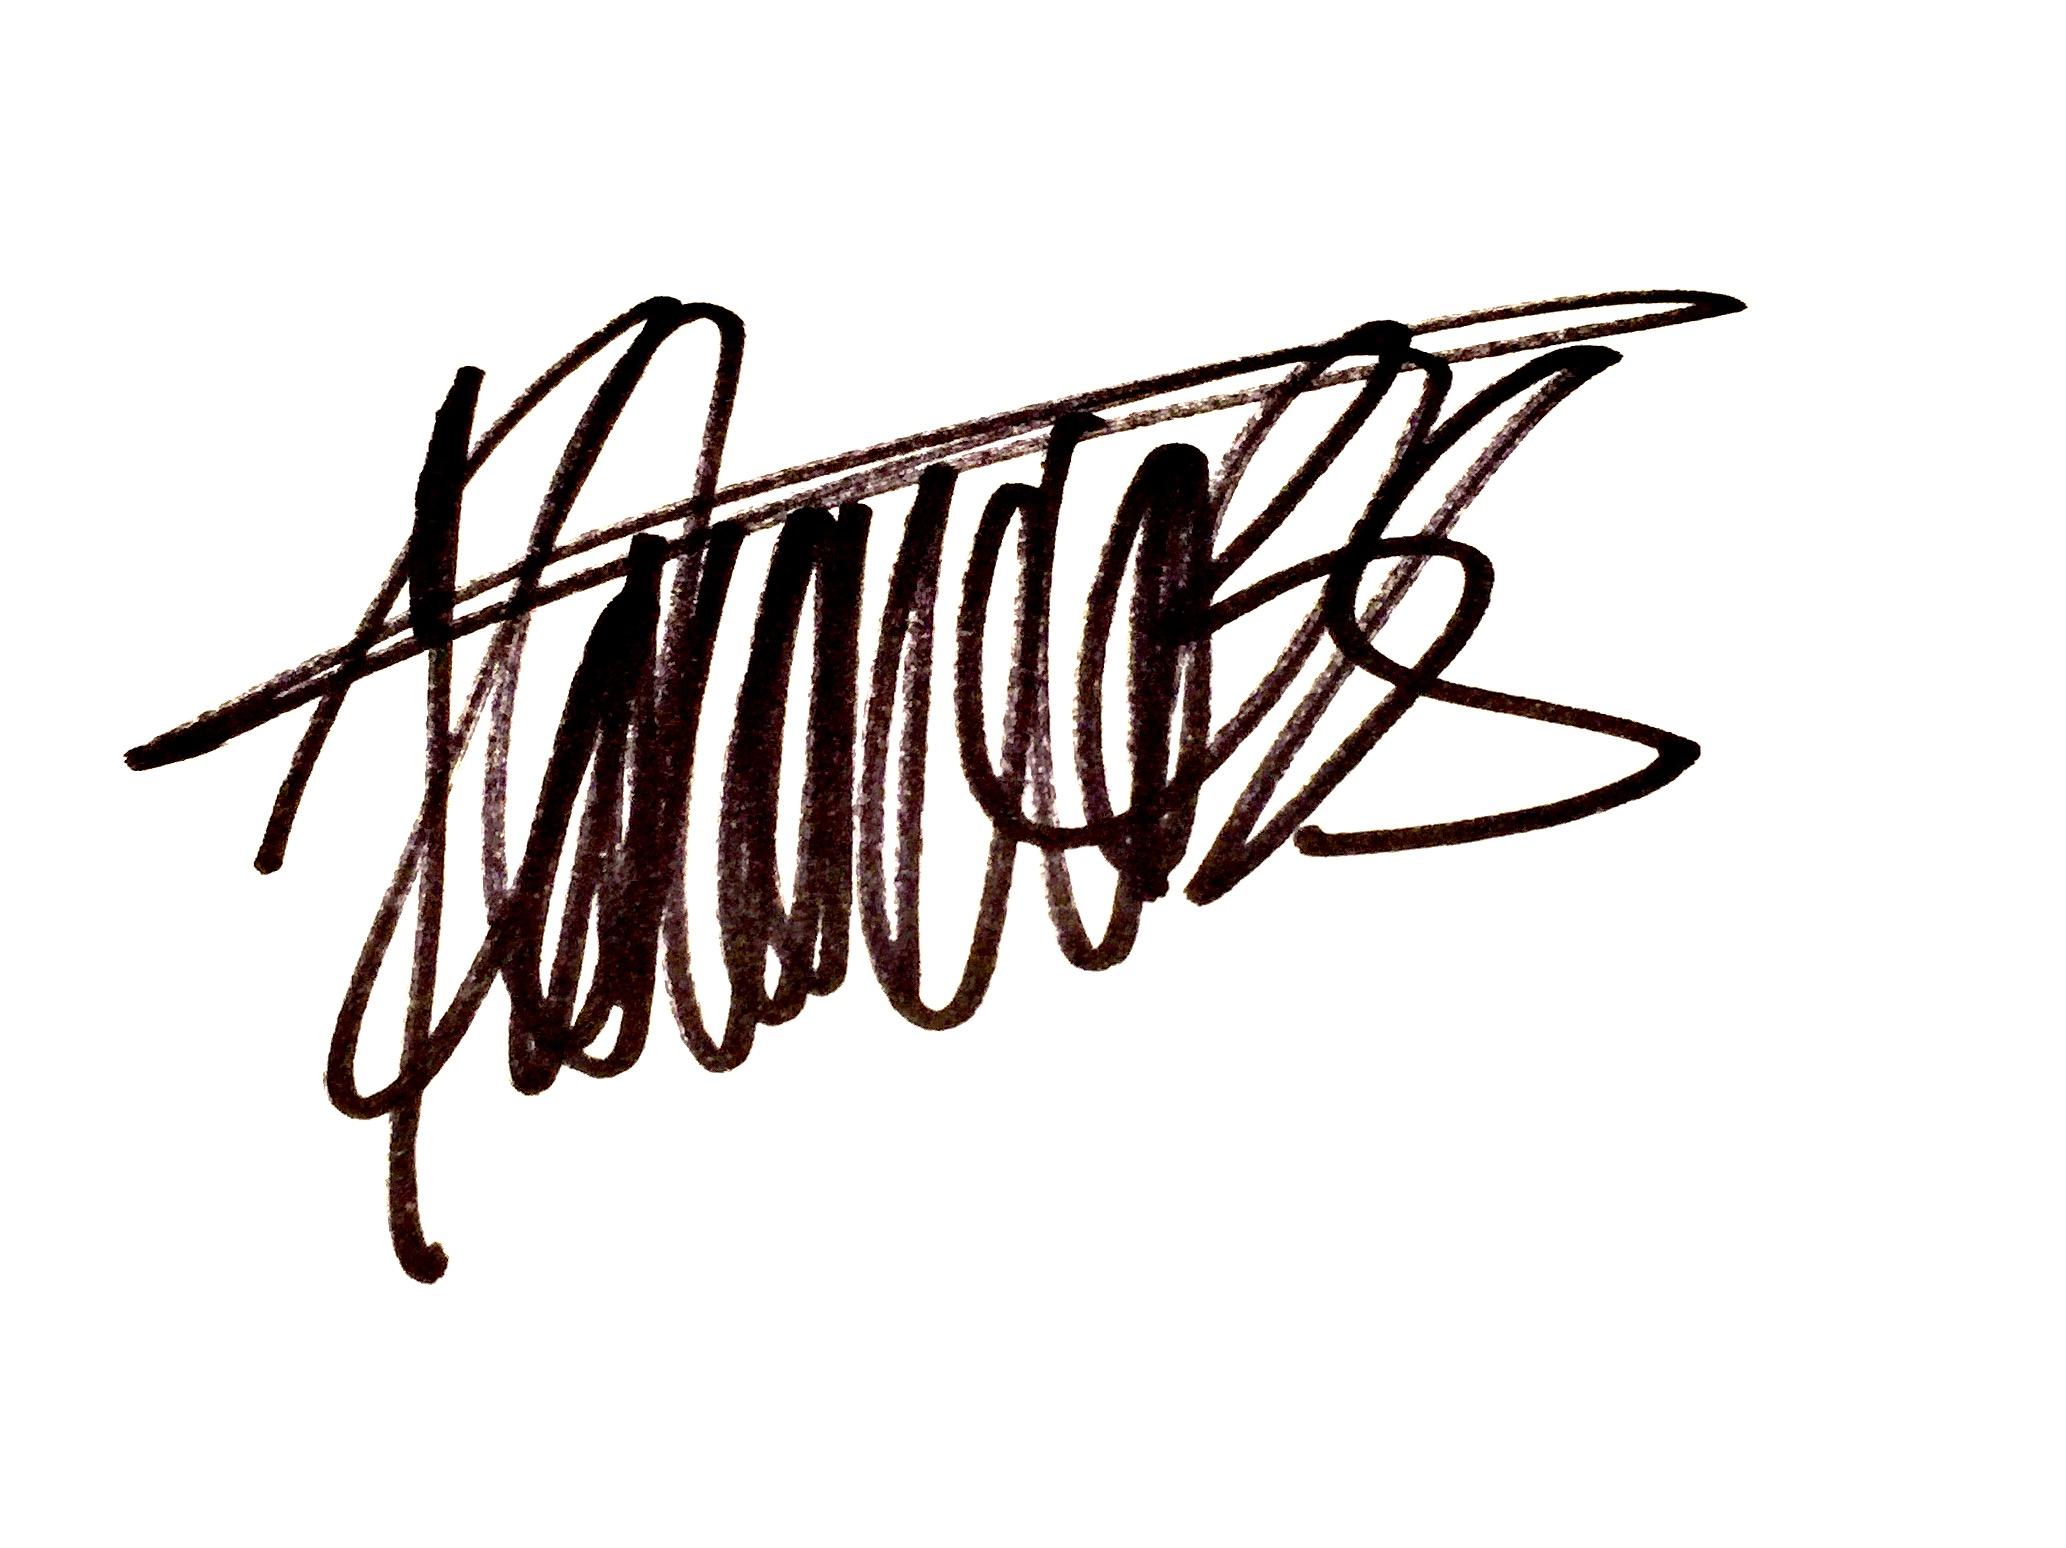 Roberto Bernal's Signature